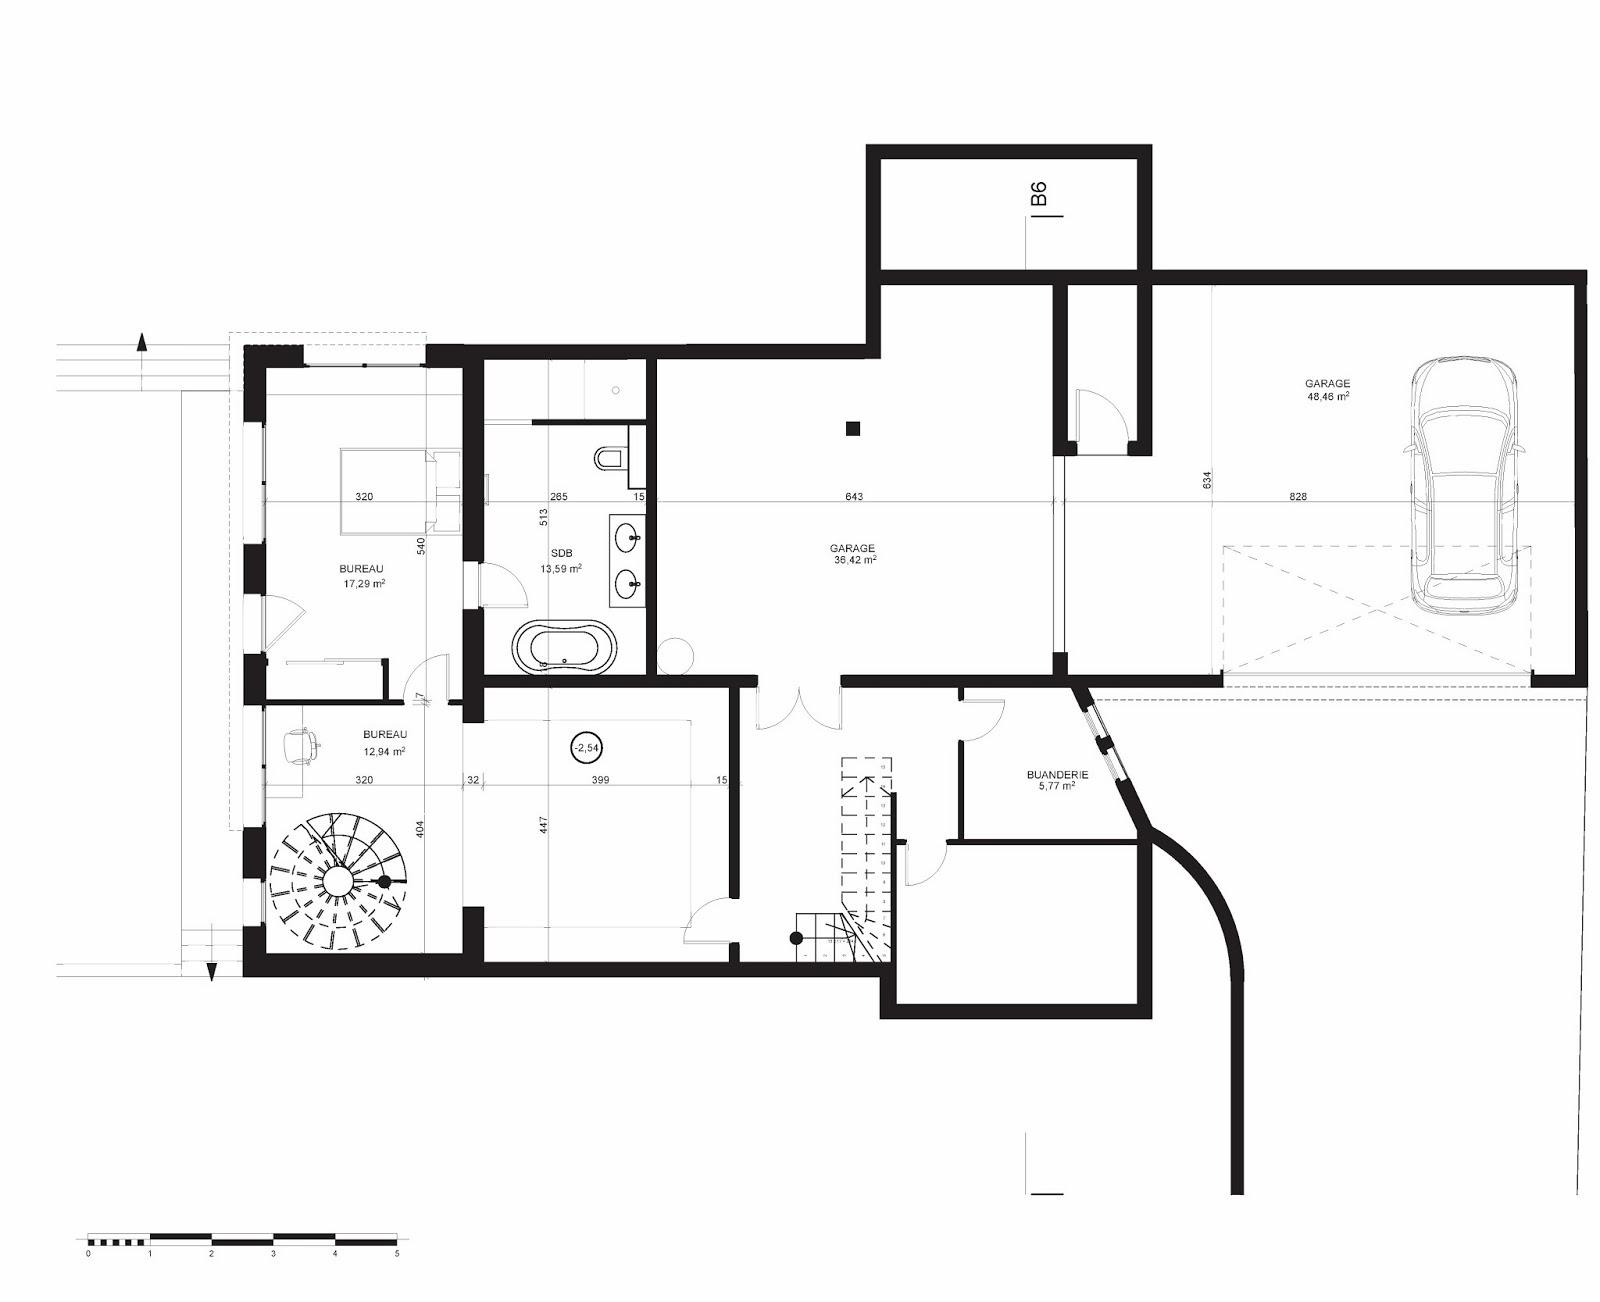 plan maison garage sous sol. Black Bedroom Furniture Sets. Home Design Ideas